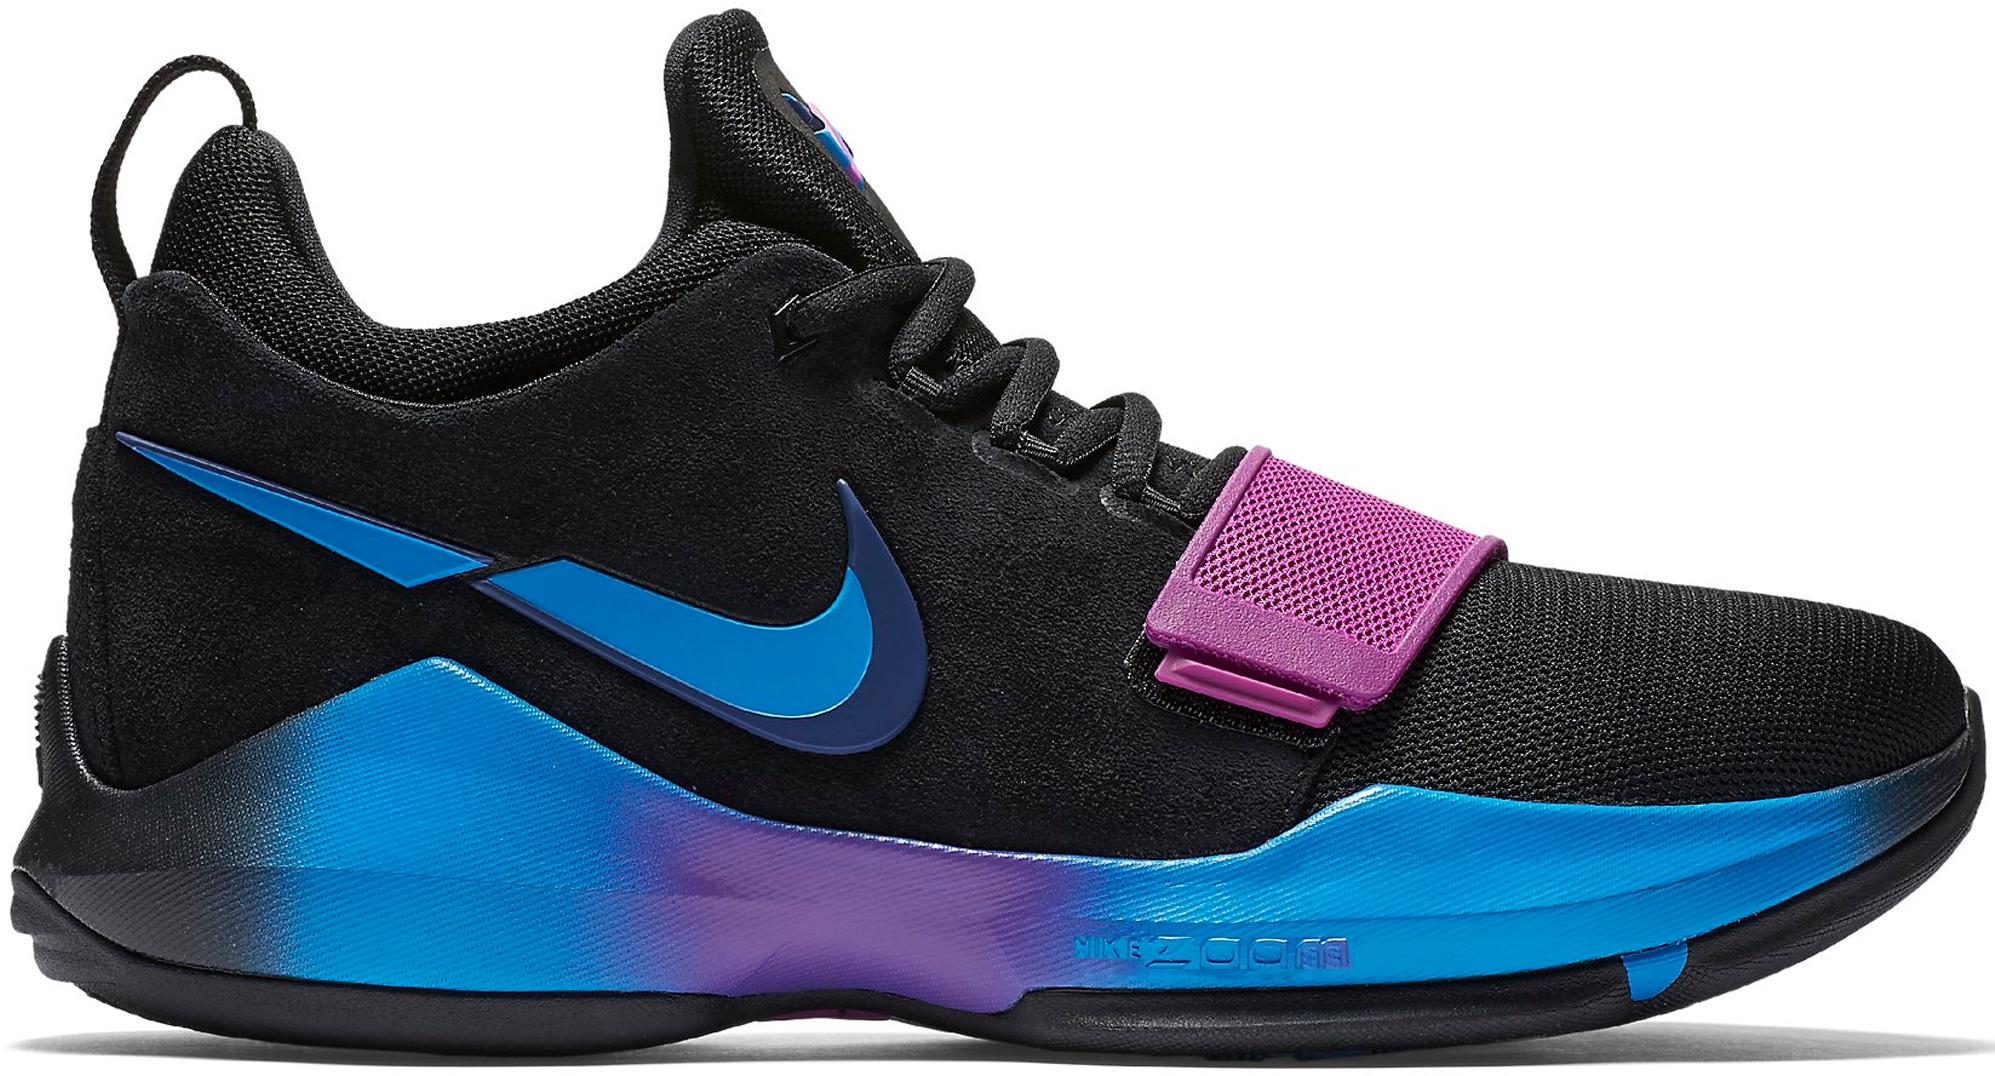 Nike PG 1 Flip The Switch